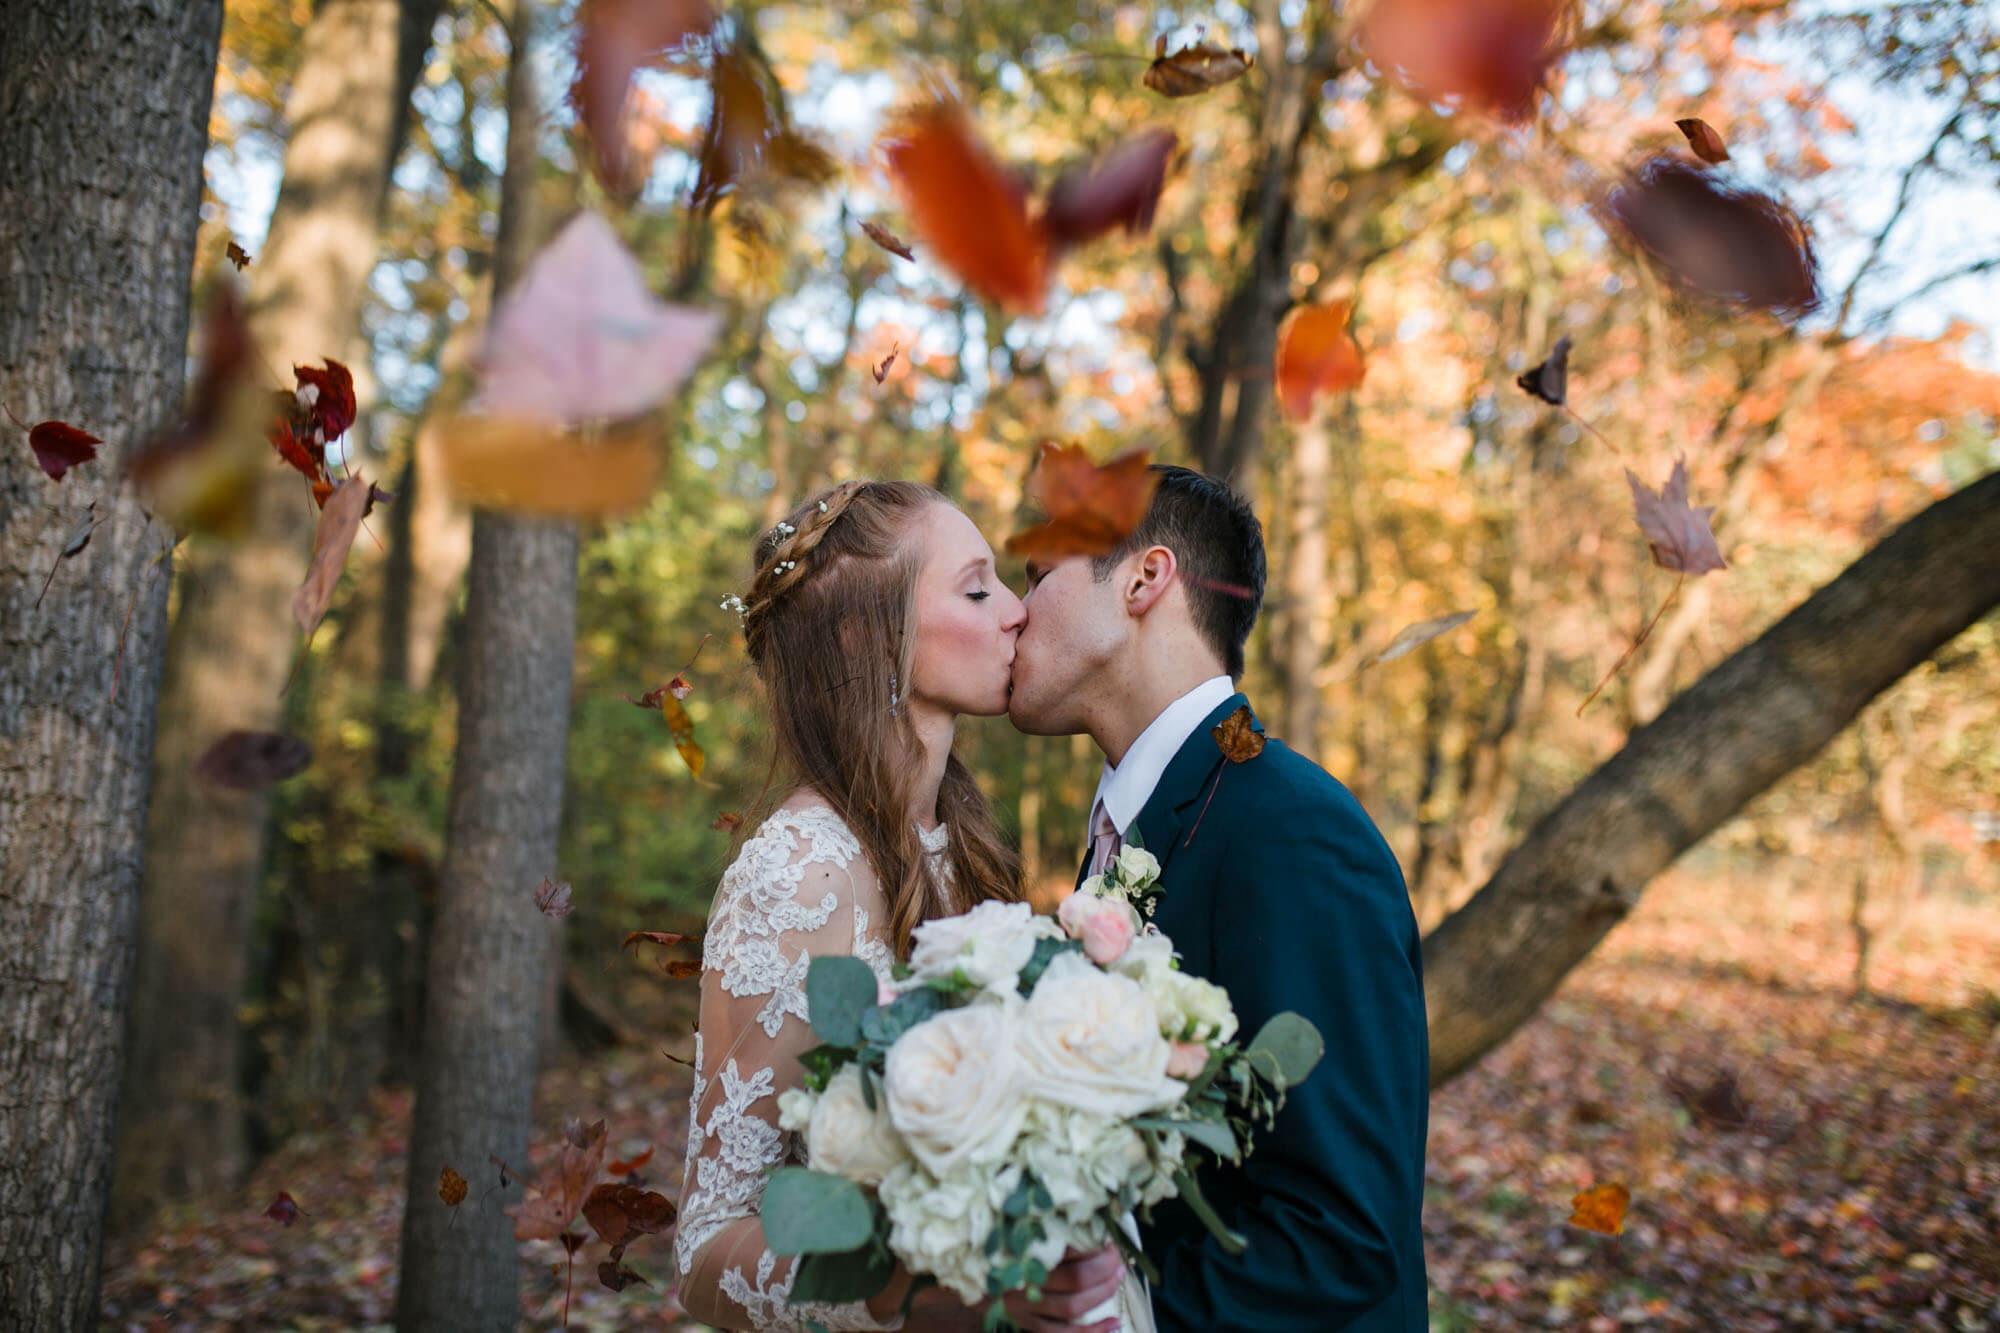 hilton-garden-inn-perrysburg-wedding-photos-147.jpg